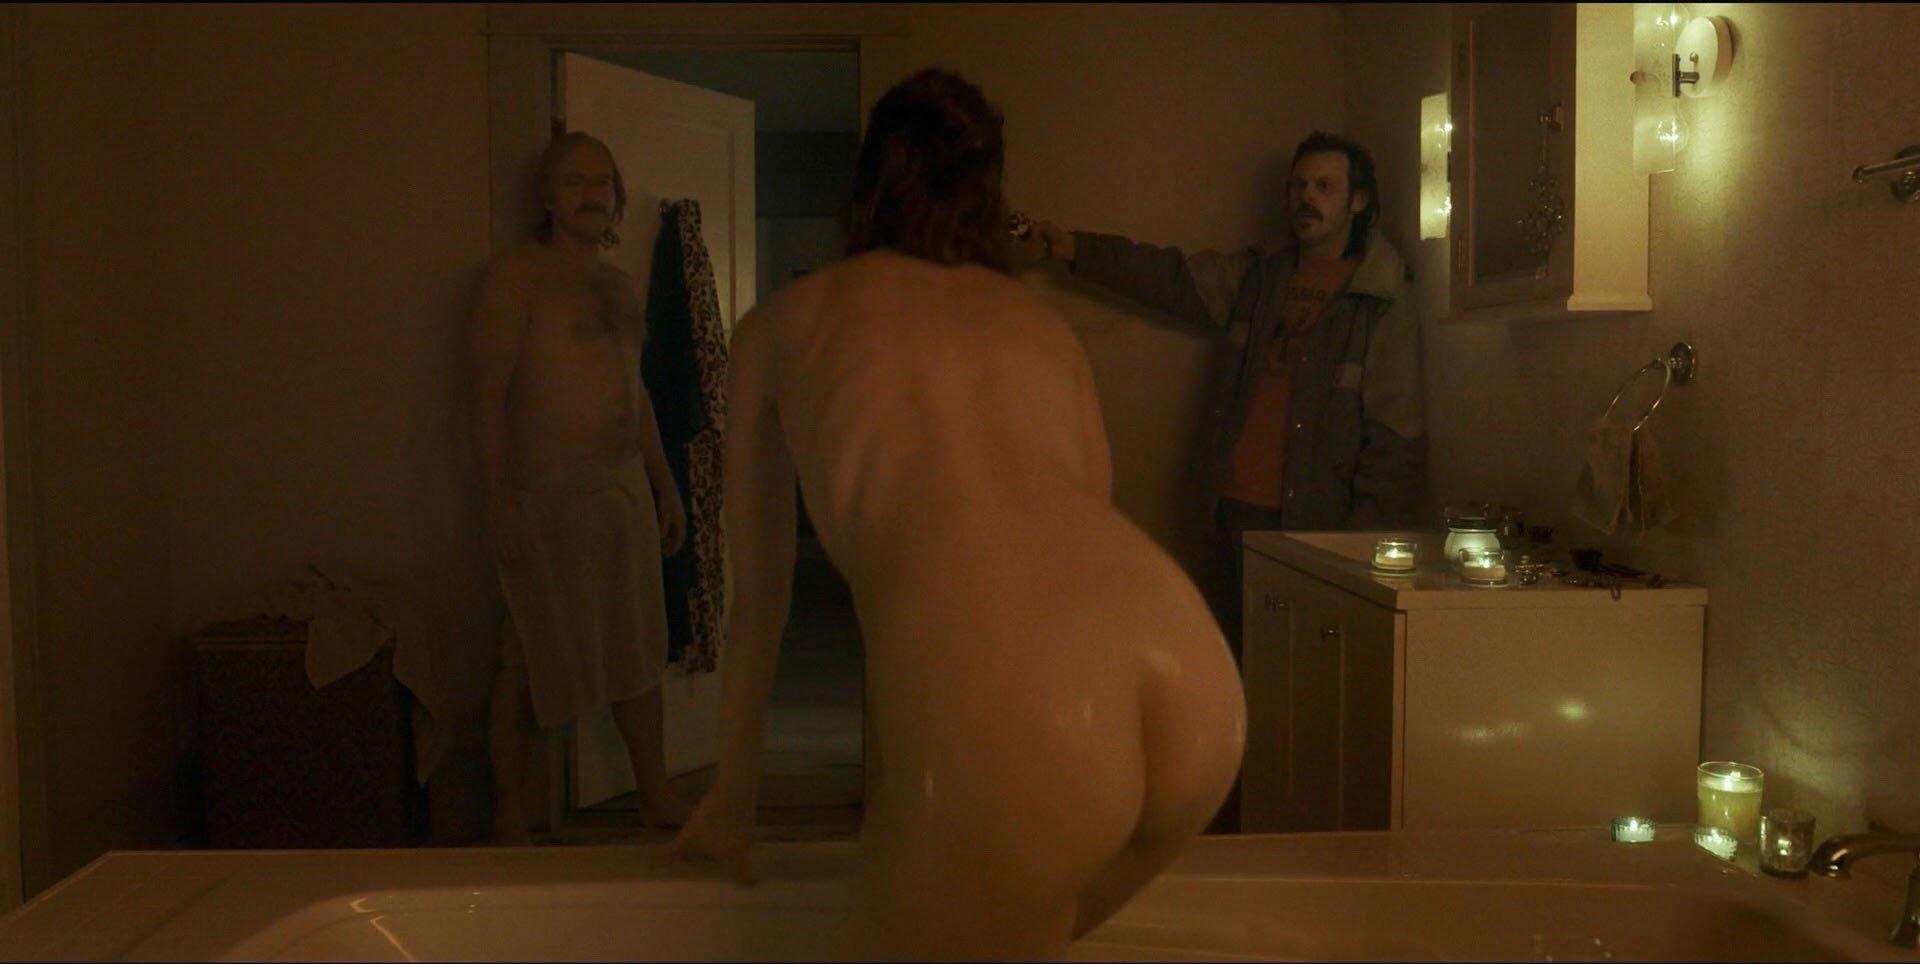 Nude Video Celebs  Mary Elizabeth Winstead - Fargo S03E01 2017-4781